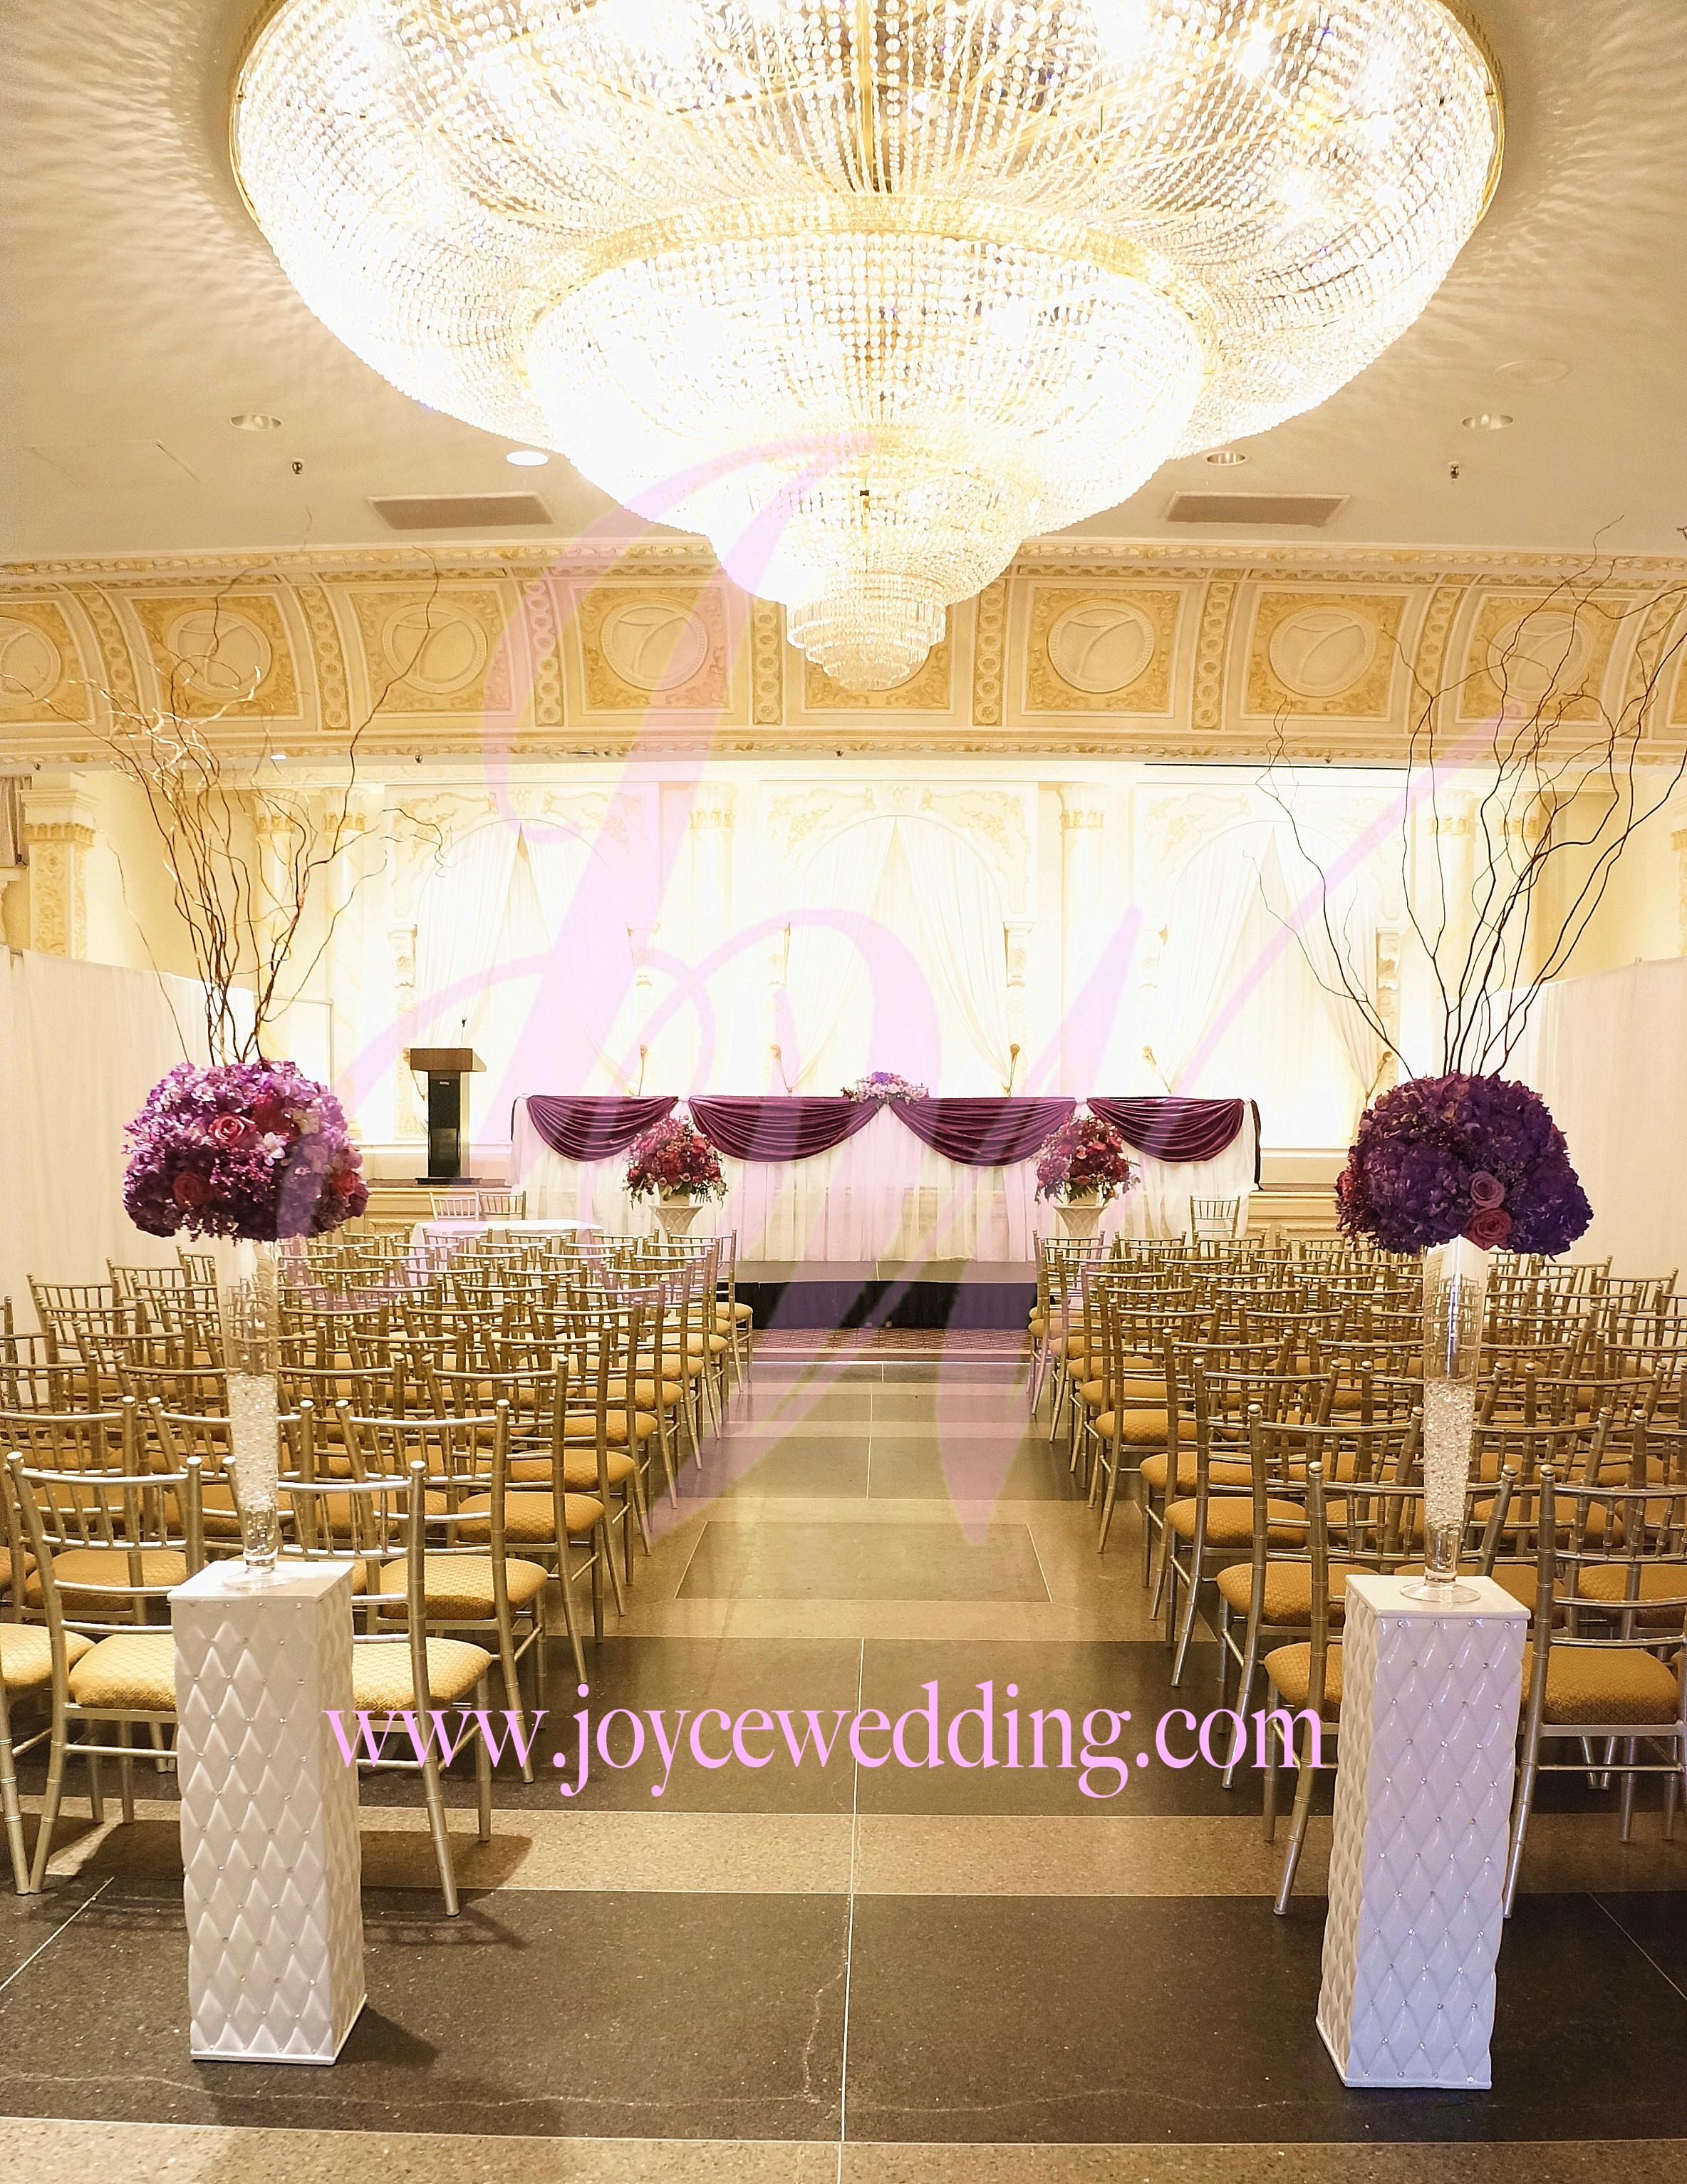 Ceremony decor modern elegance with royal purple